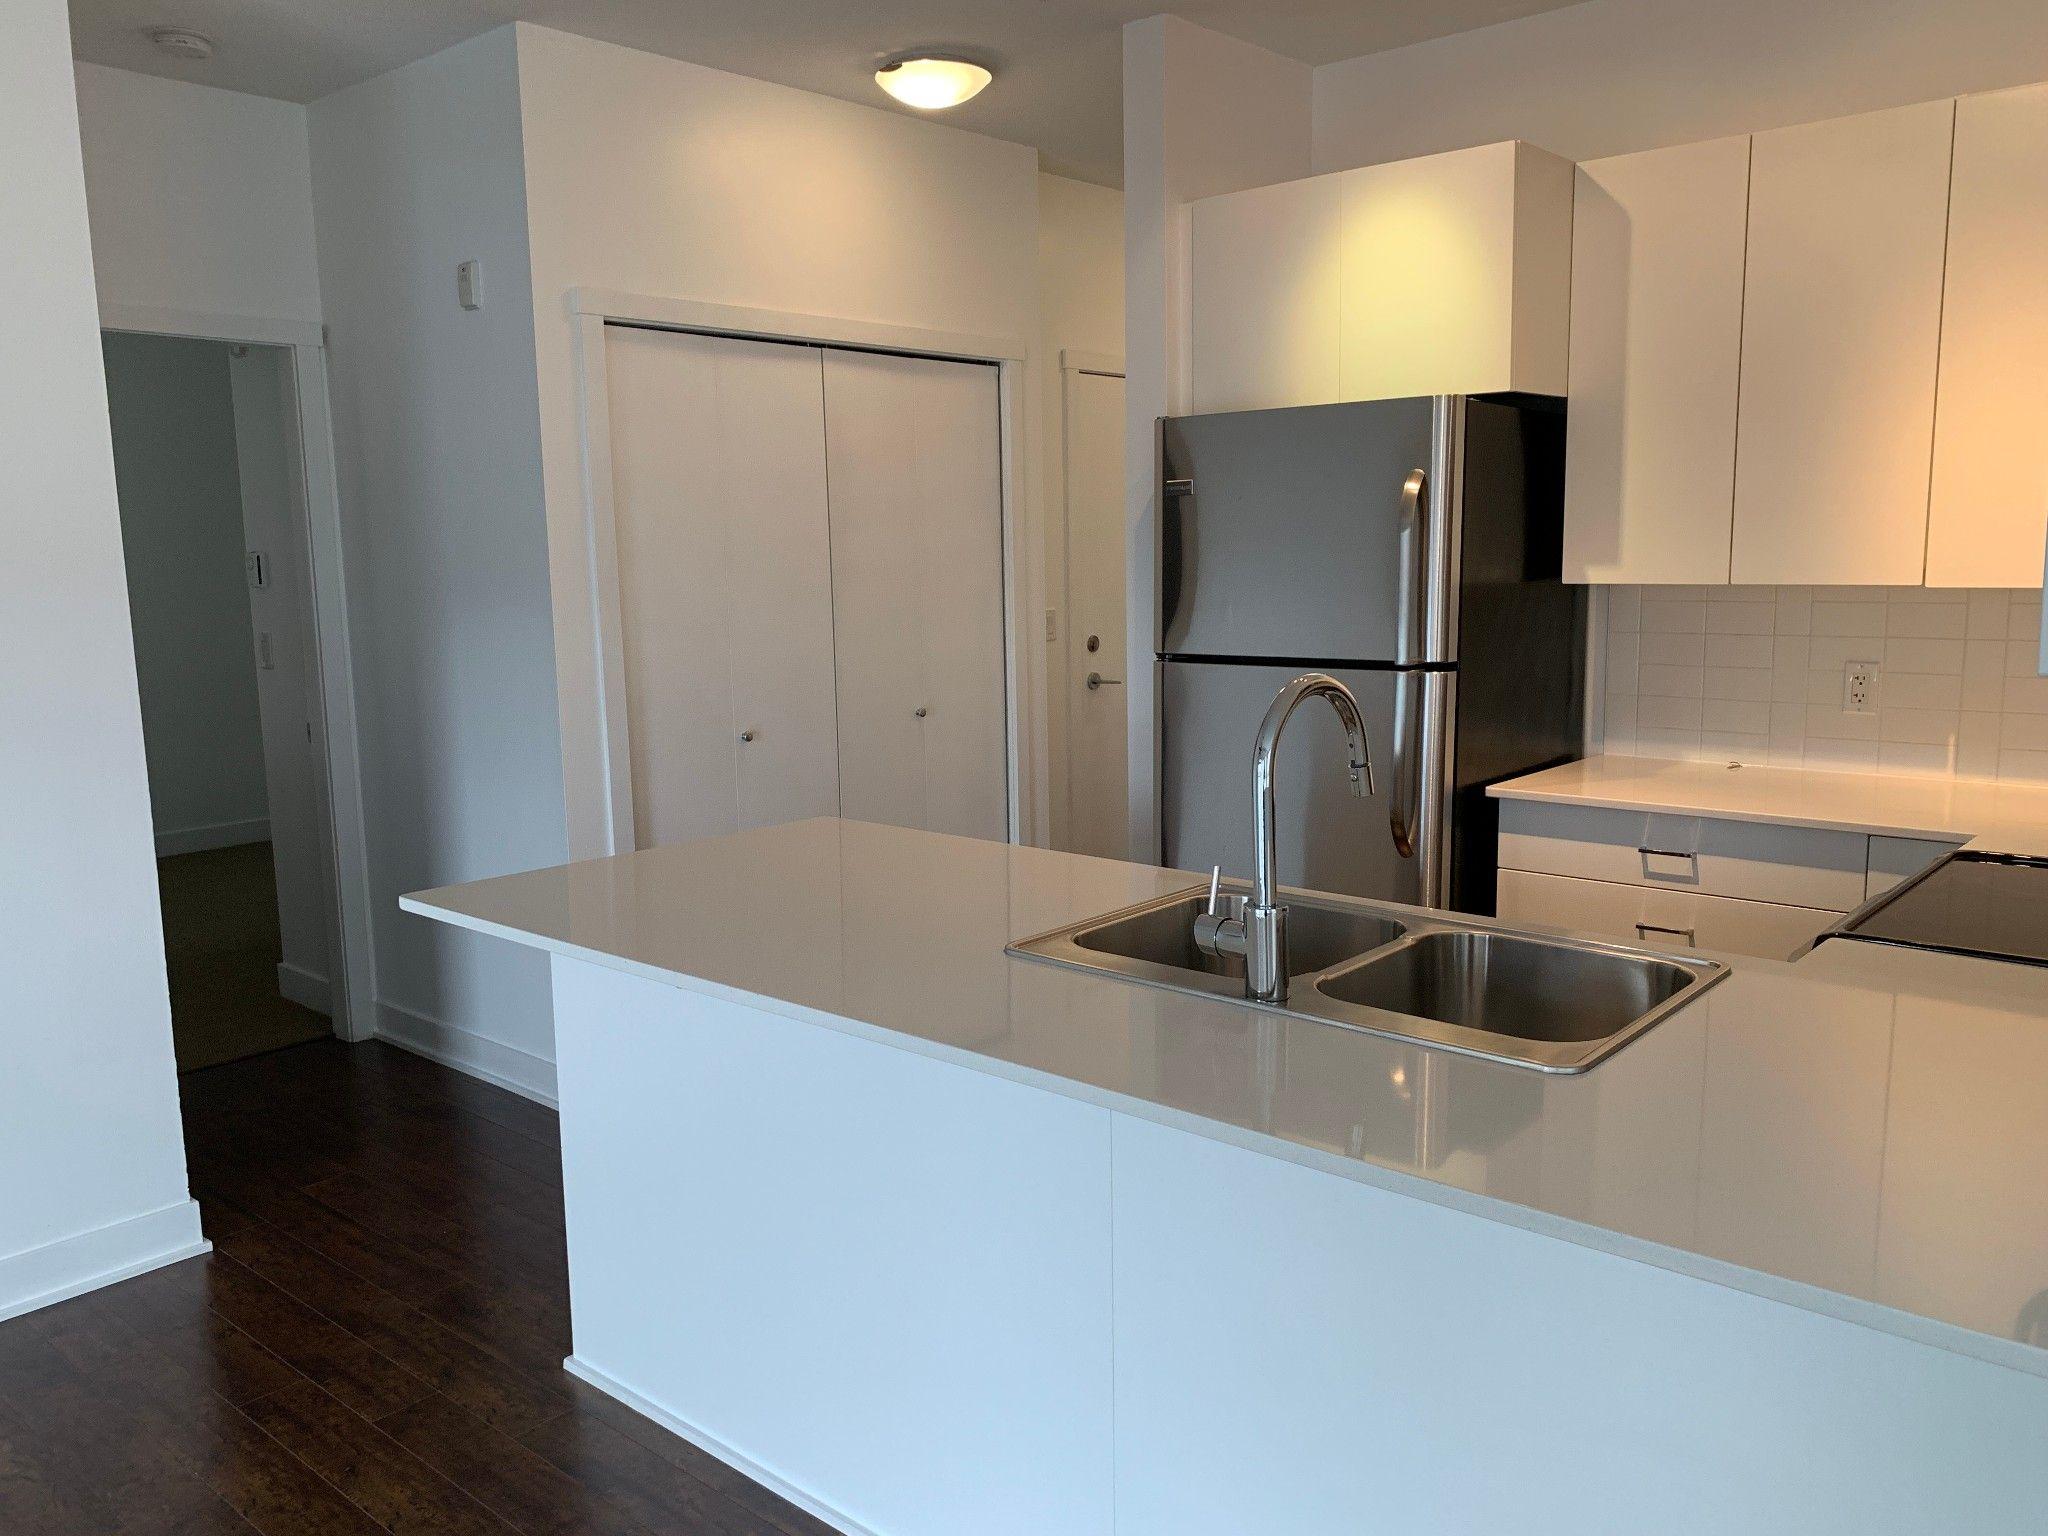 Photo 6: Photos: #212 20460 Douglas Crescent in Langley: Condo for rent